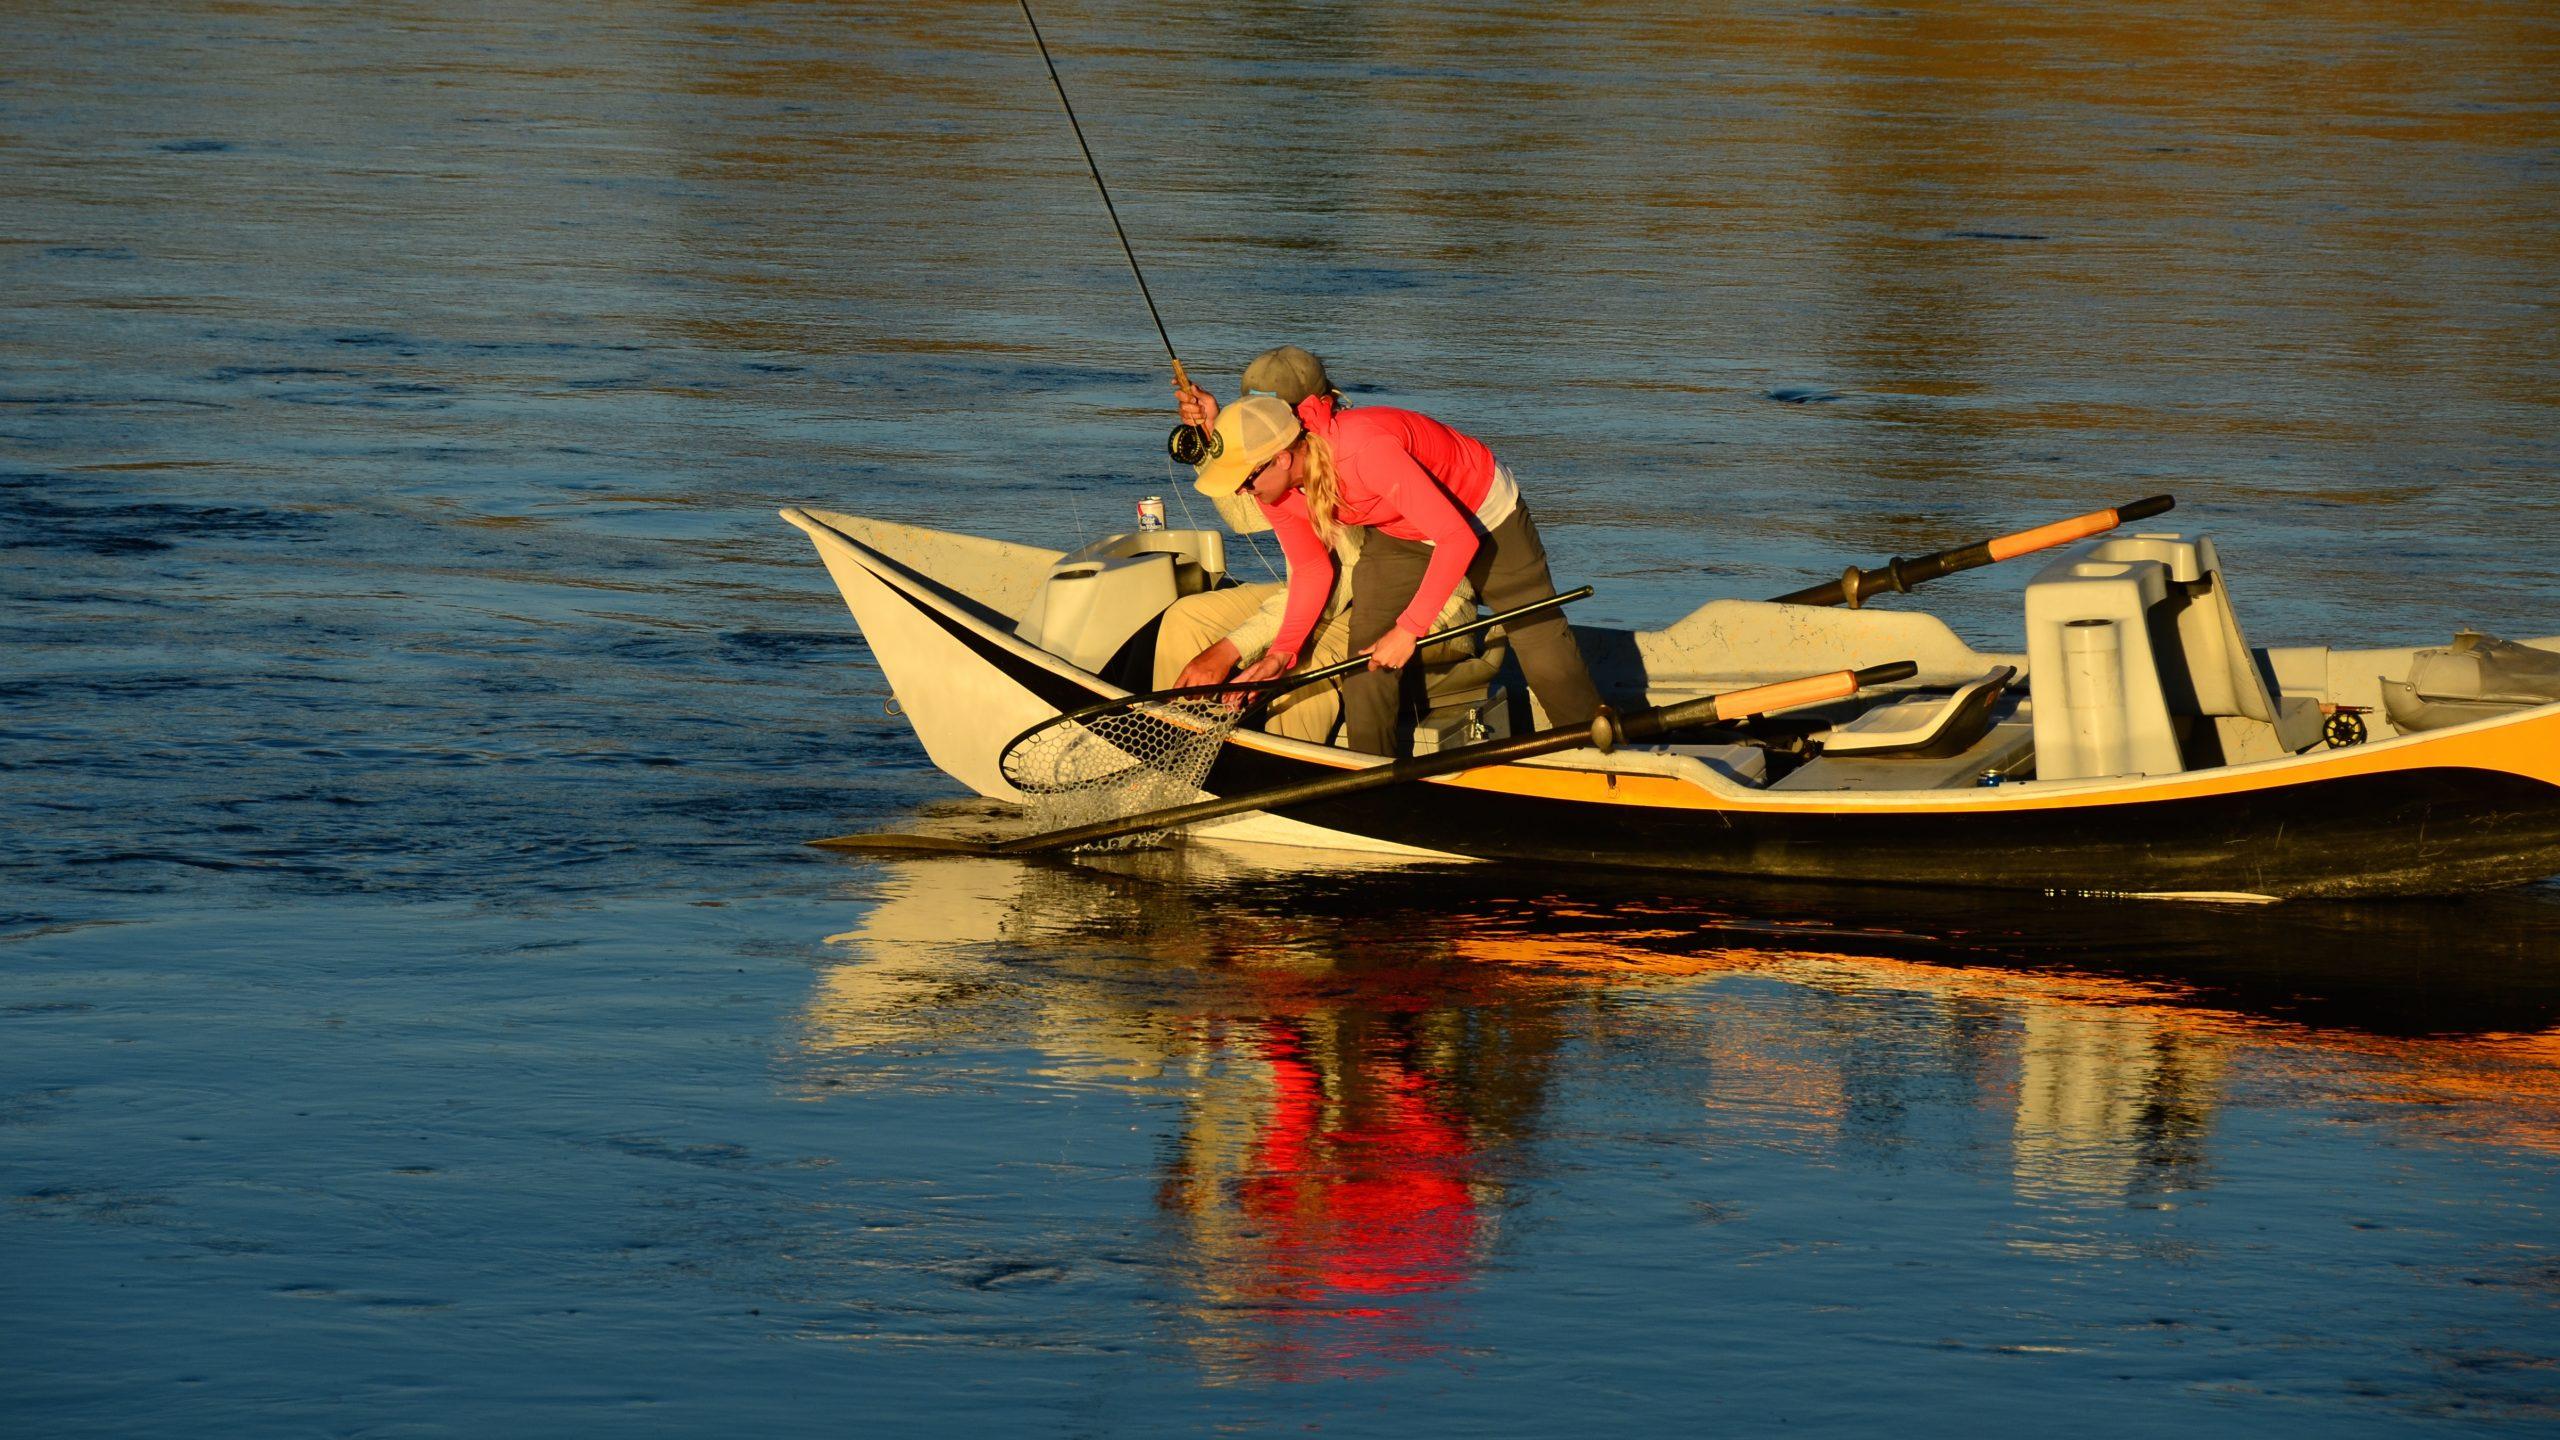 Monday July 5th Missouri River Fishing Report